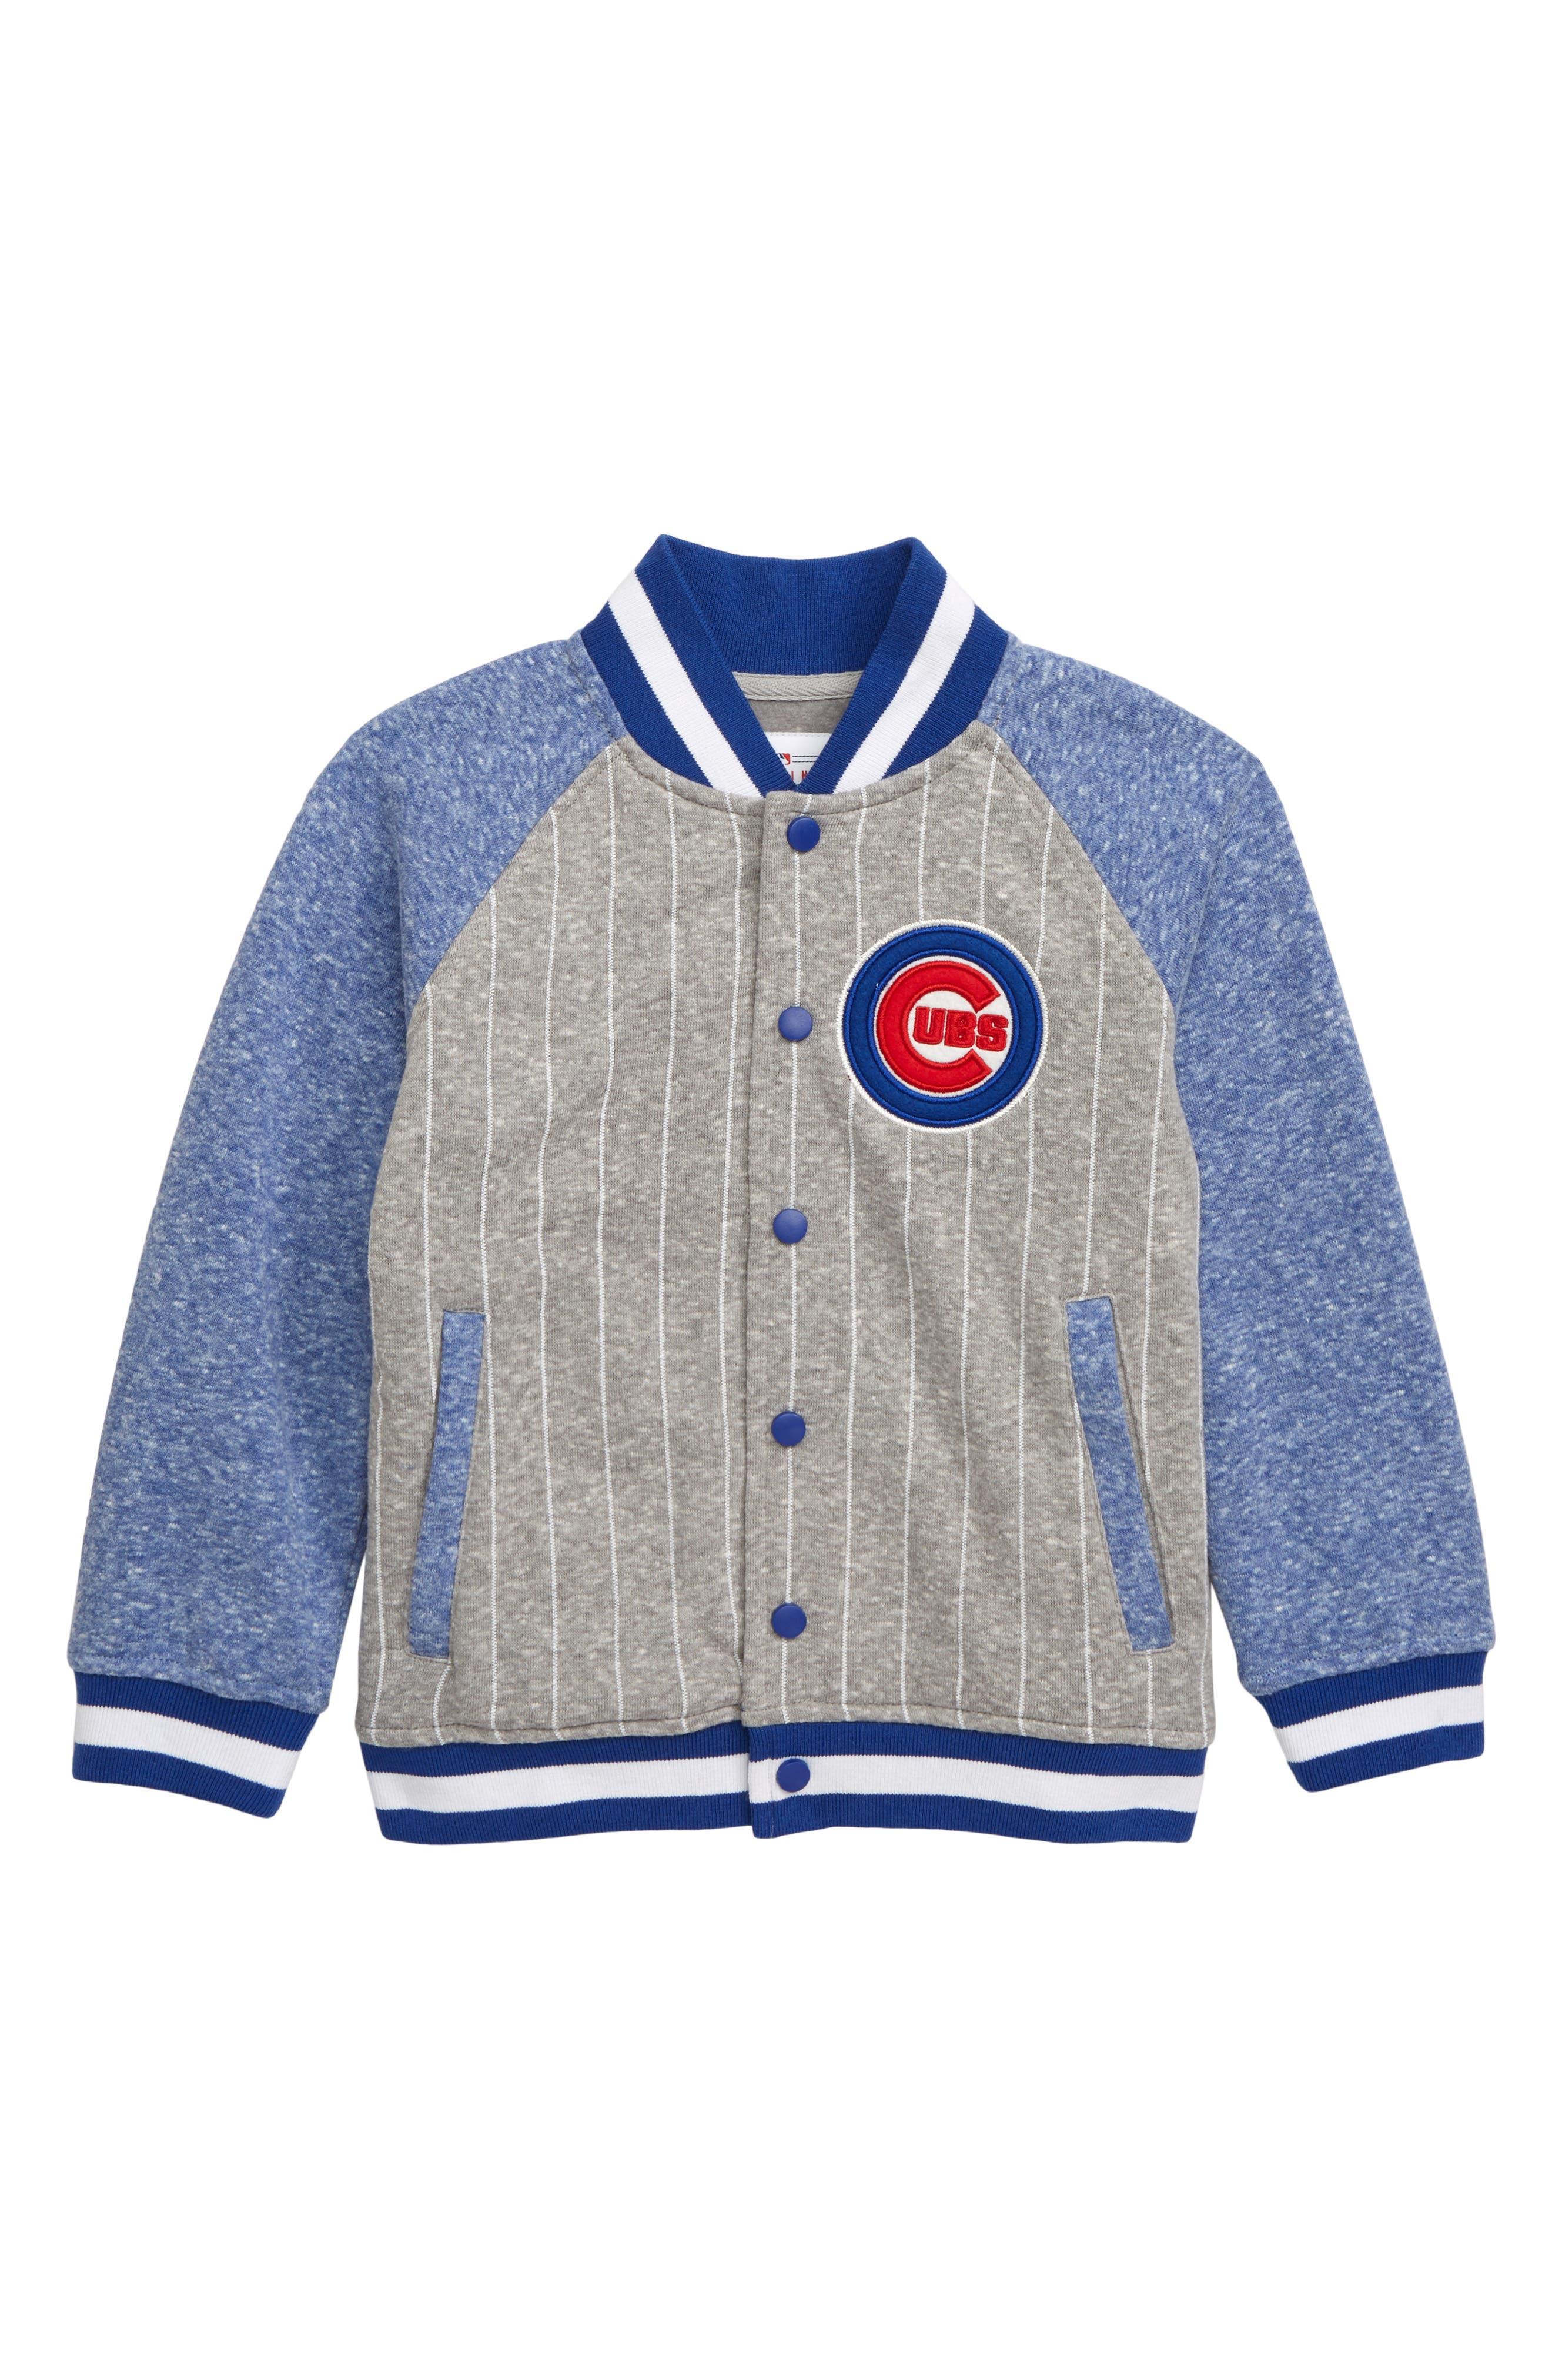 Toddler Boys Majestic Mlb Chicago Cubs Pride Fleece Bomber Jacket Size 4T  Blue